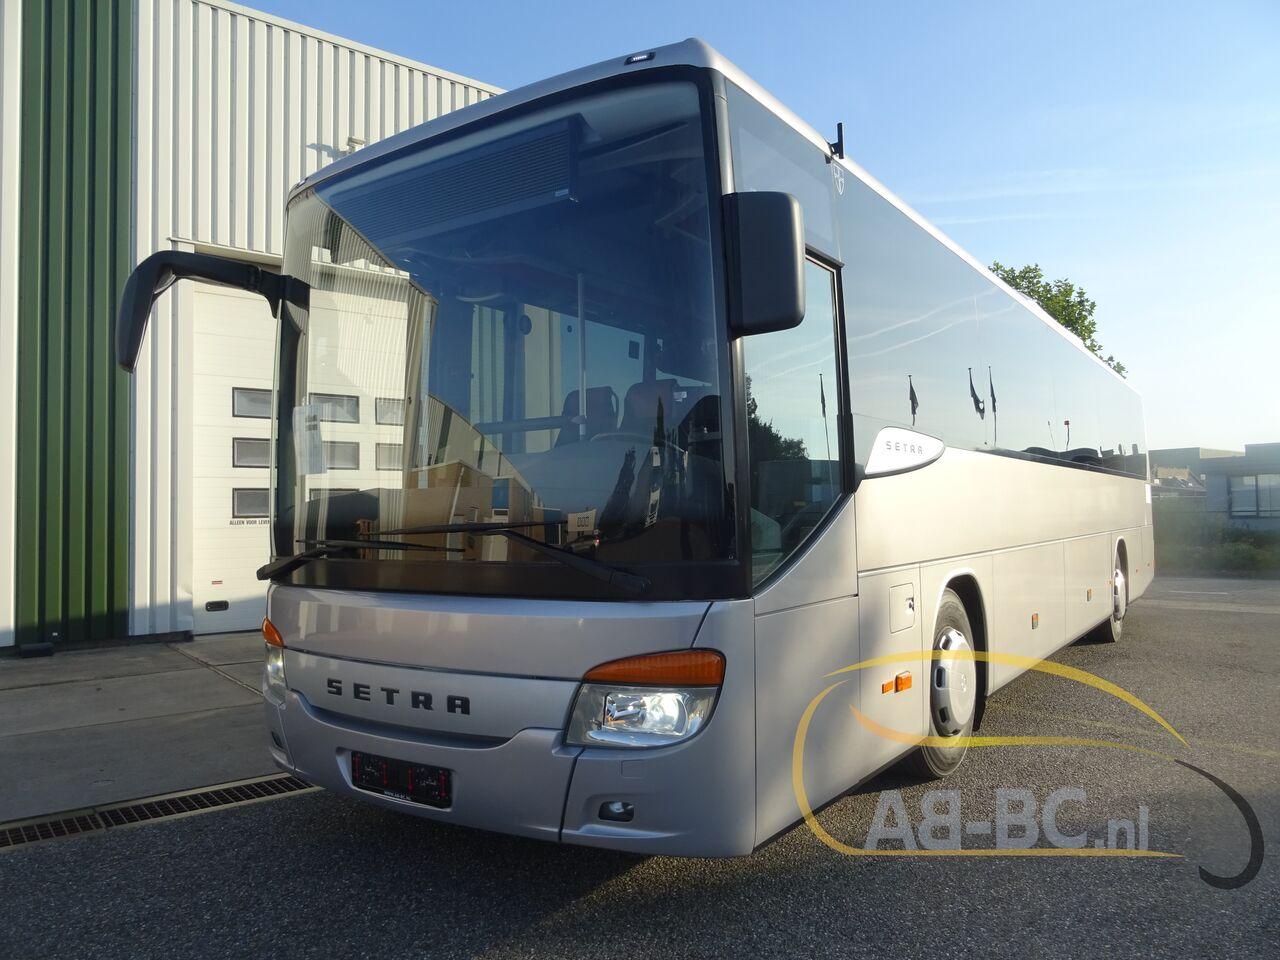 coach-bus-SETRA-S415H-52-Seats-EURO-6-Liftbus---1630913109692640644_big_b050b7155237838beabb5ab0198079b9--21070517141280735500